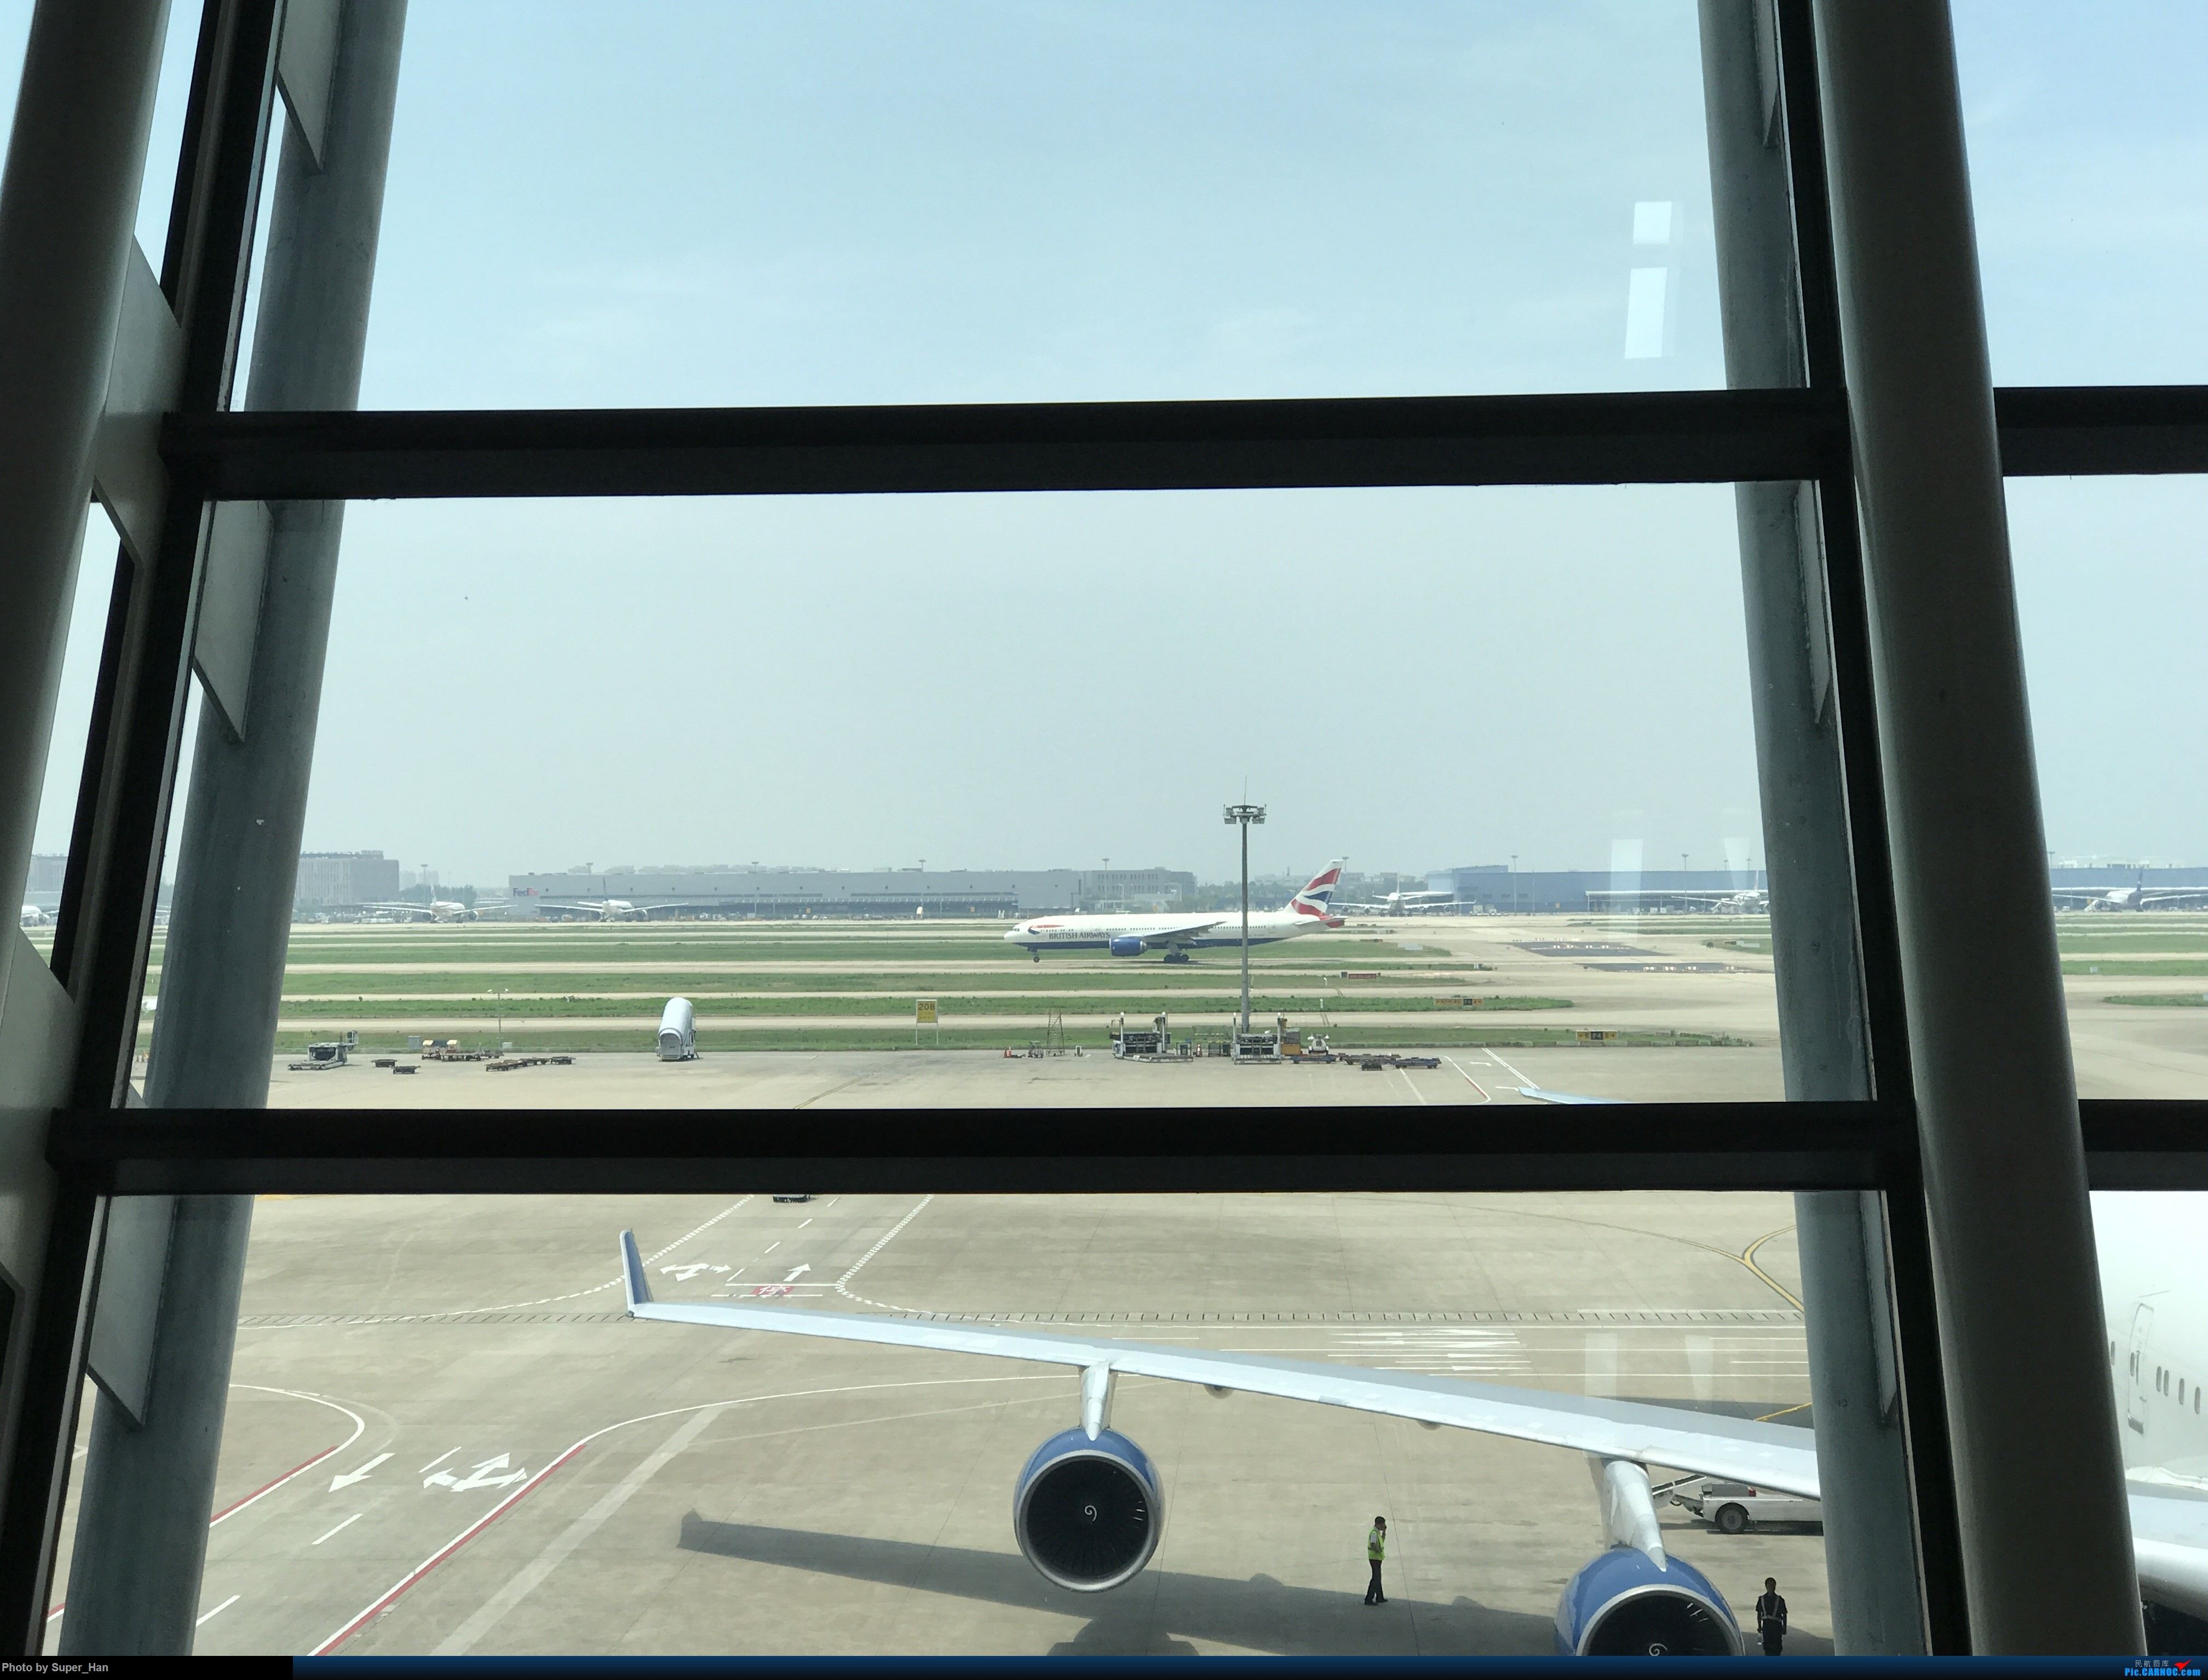 Re:[原创]PVG-AMS 第一次走进阿姆斯特丹史基浦机场! BOEING 777-200  中国上海浦东国际机场